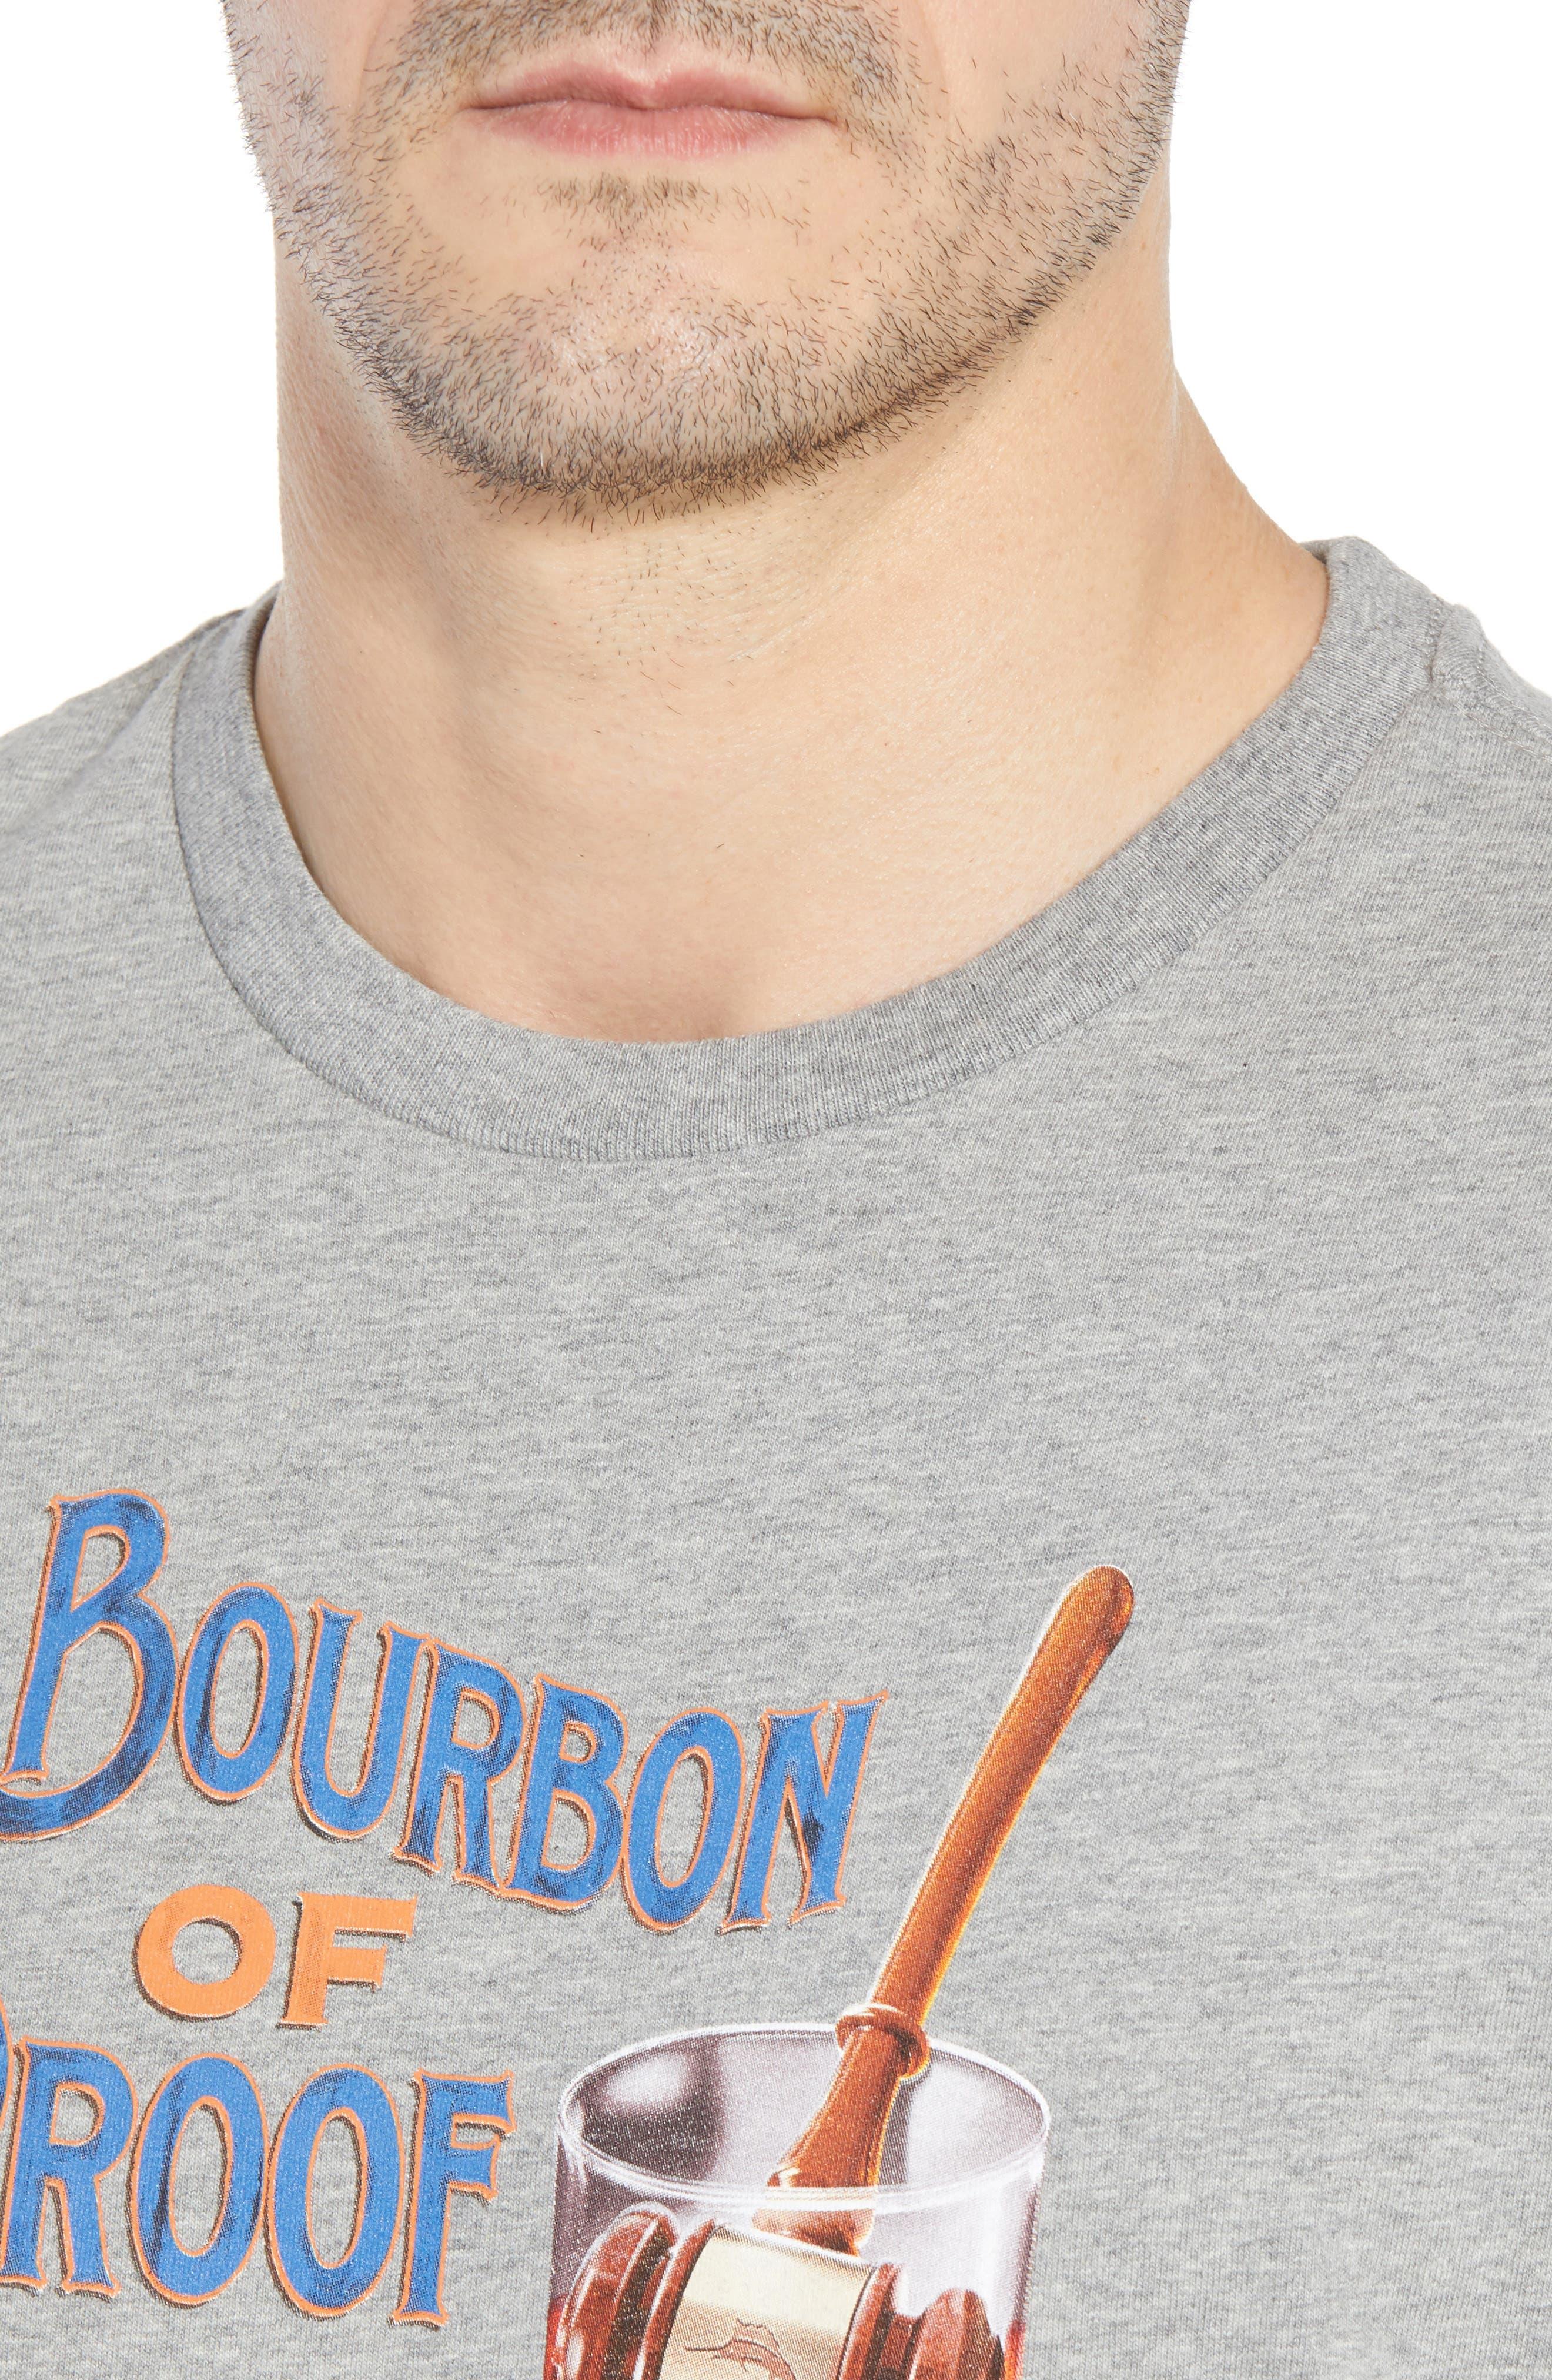 Bourbon of Proof Graphic T-Shirt,                             Alternate thumbnail 4, color,                             050